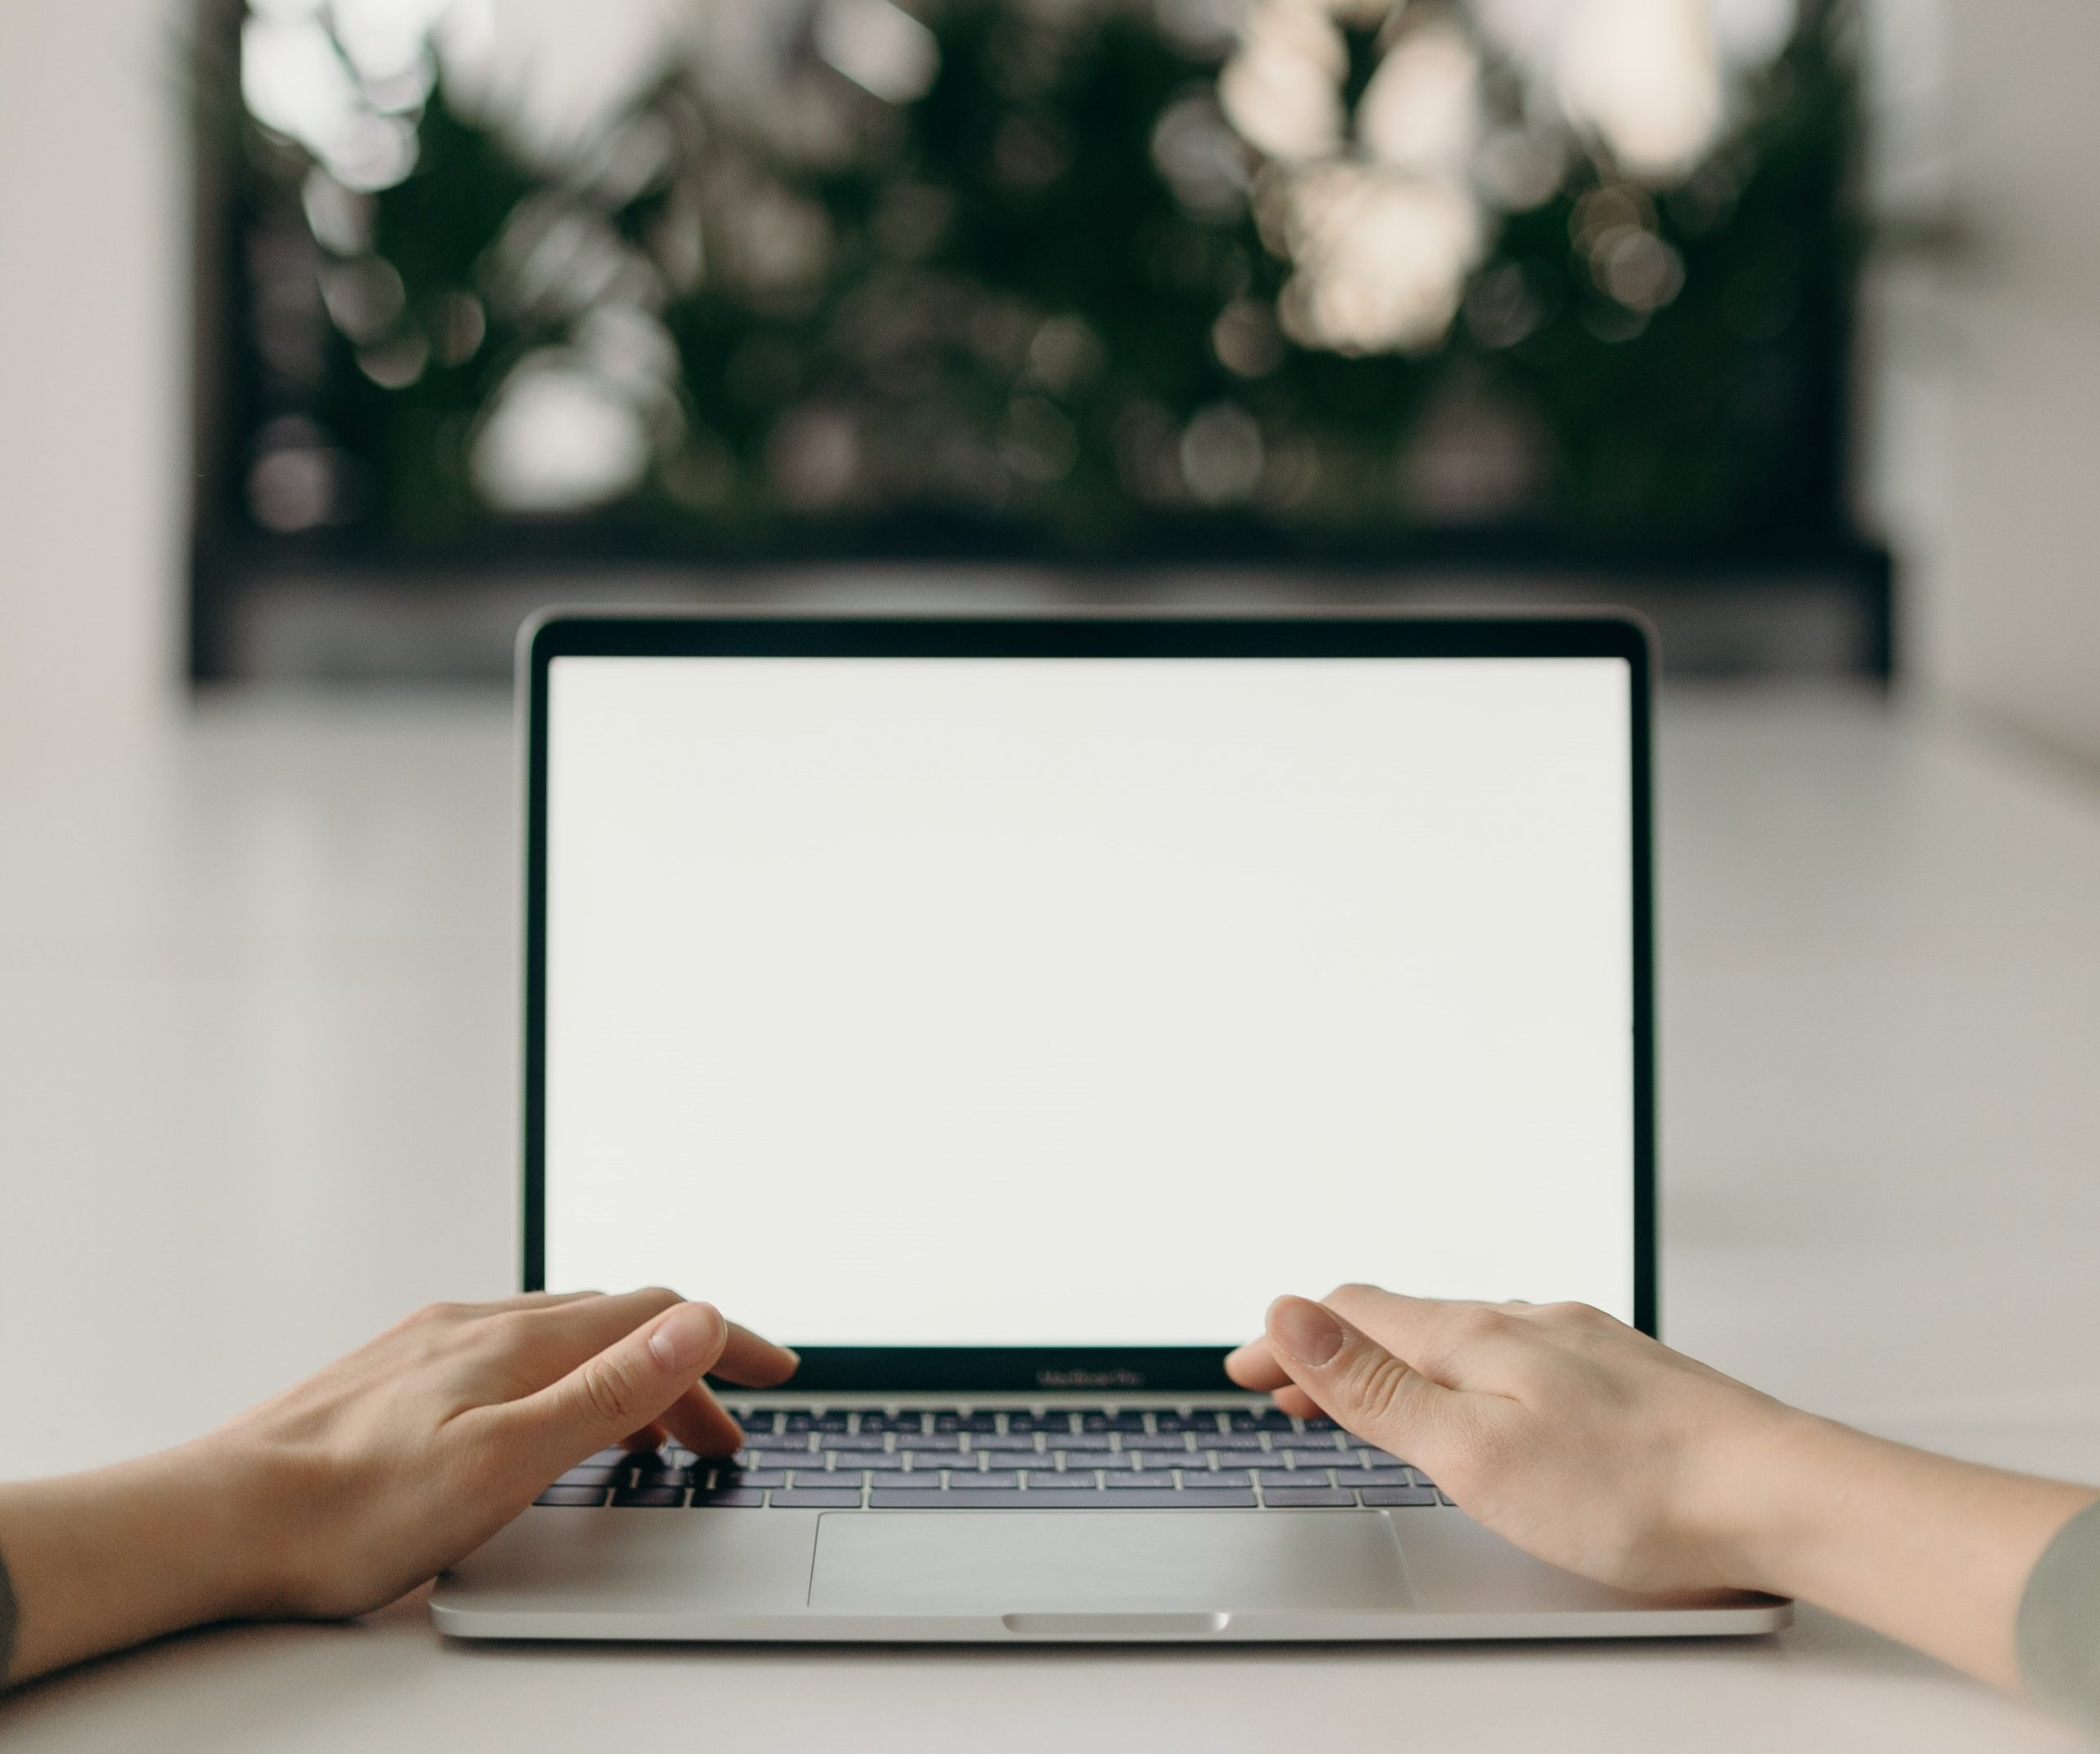 2020 ILEA Implements On-Line Learning Academy